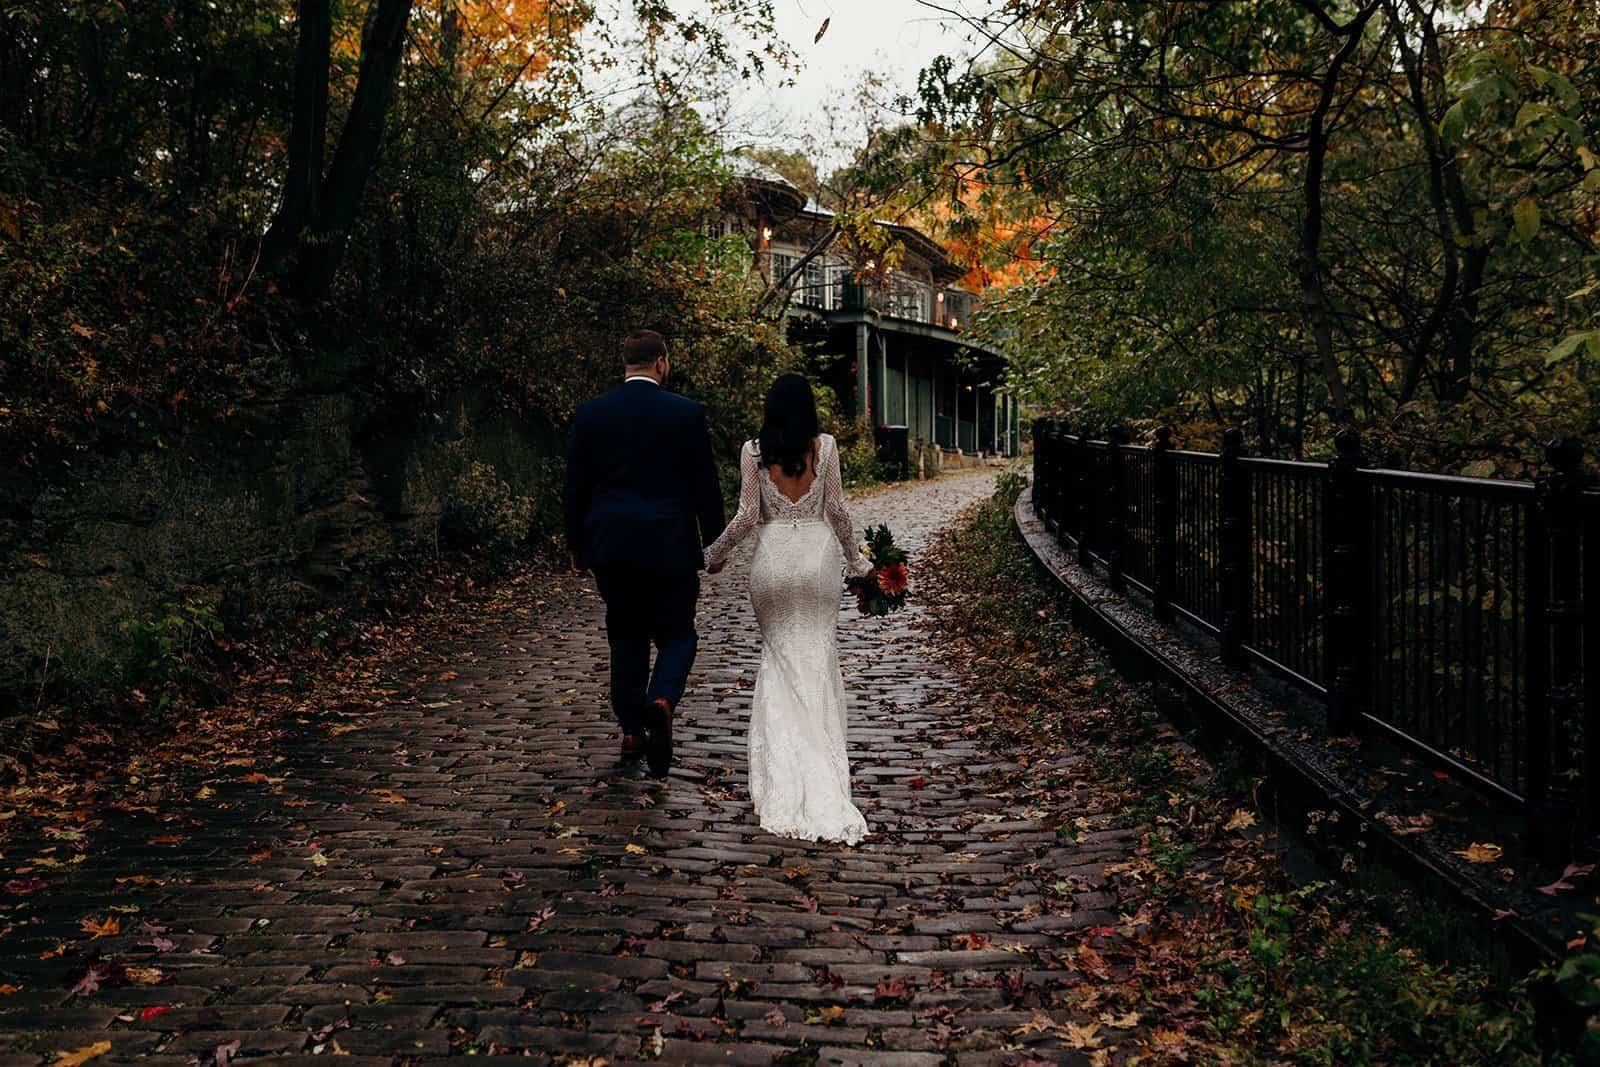 bride and groom walk away on brick pathway